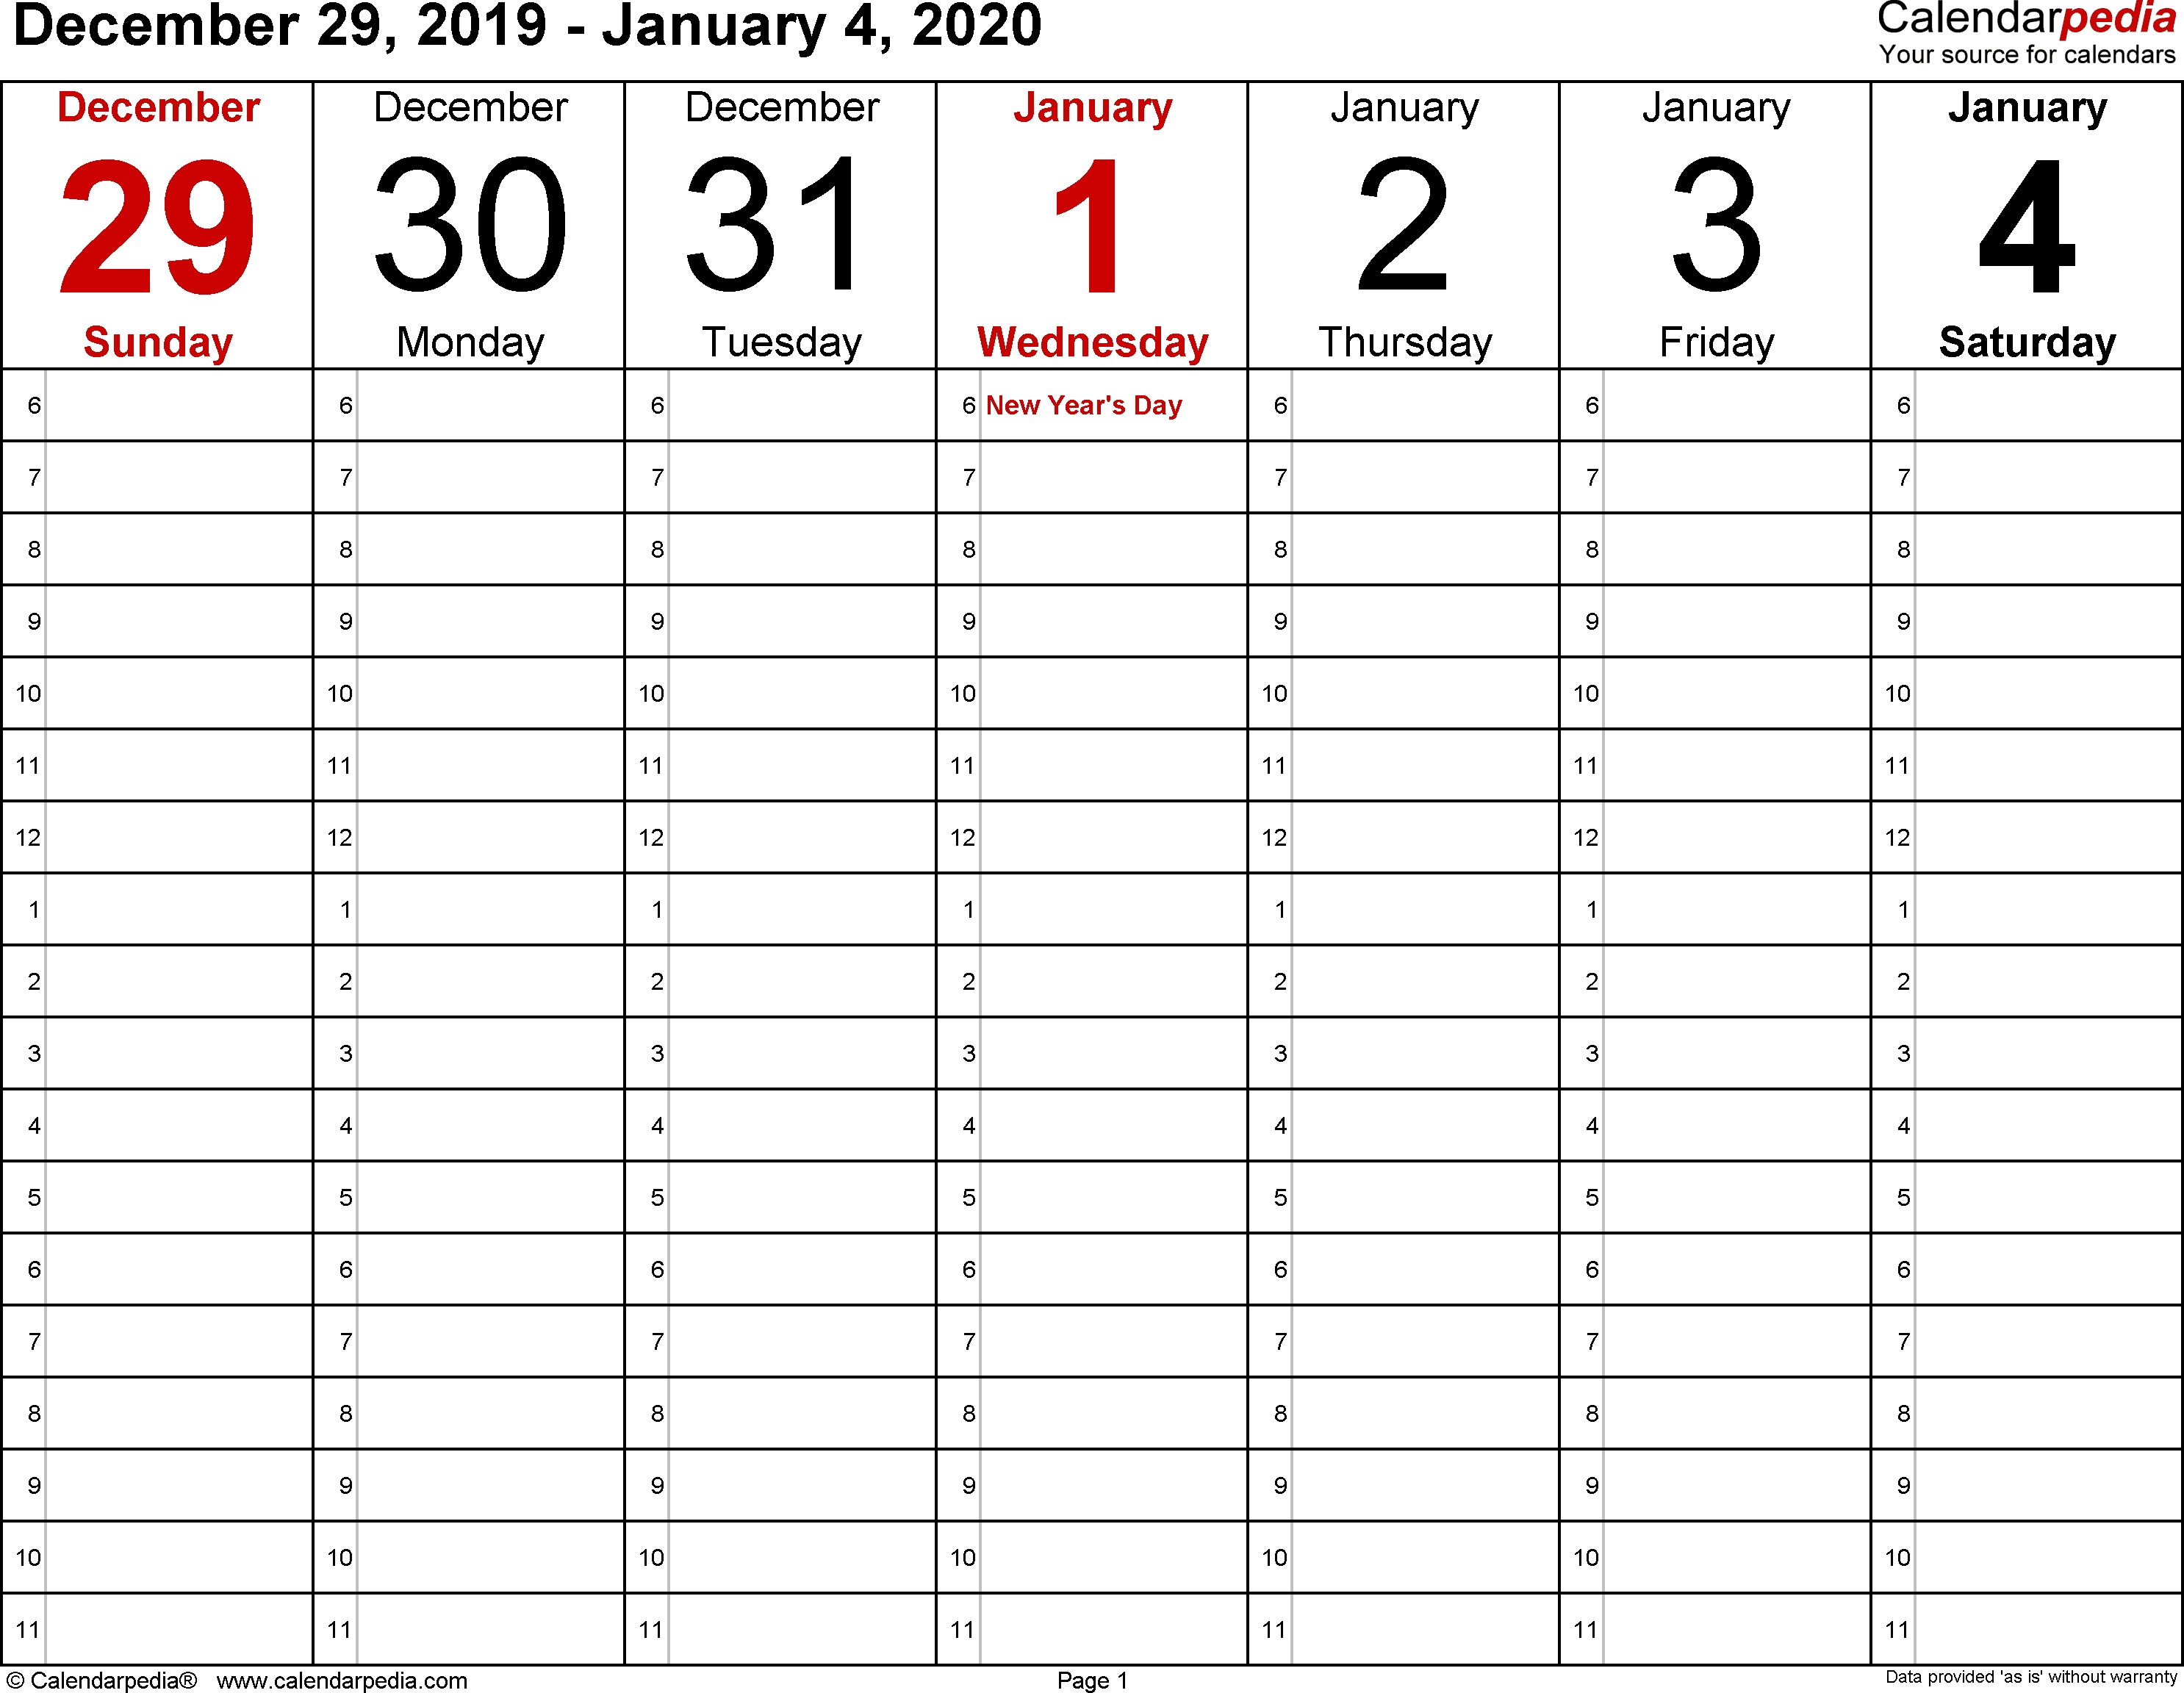 Weekly Calendar 2020 For Word - 12 Free Printable Templates throughout Printable Calendar For 2020 To Type On